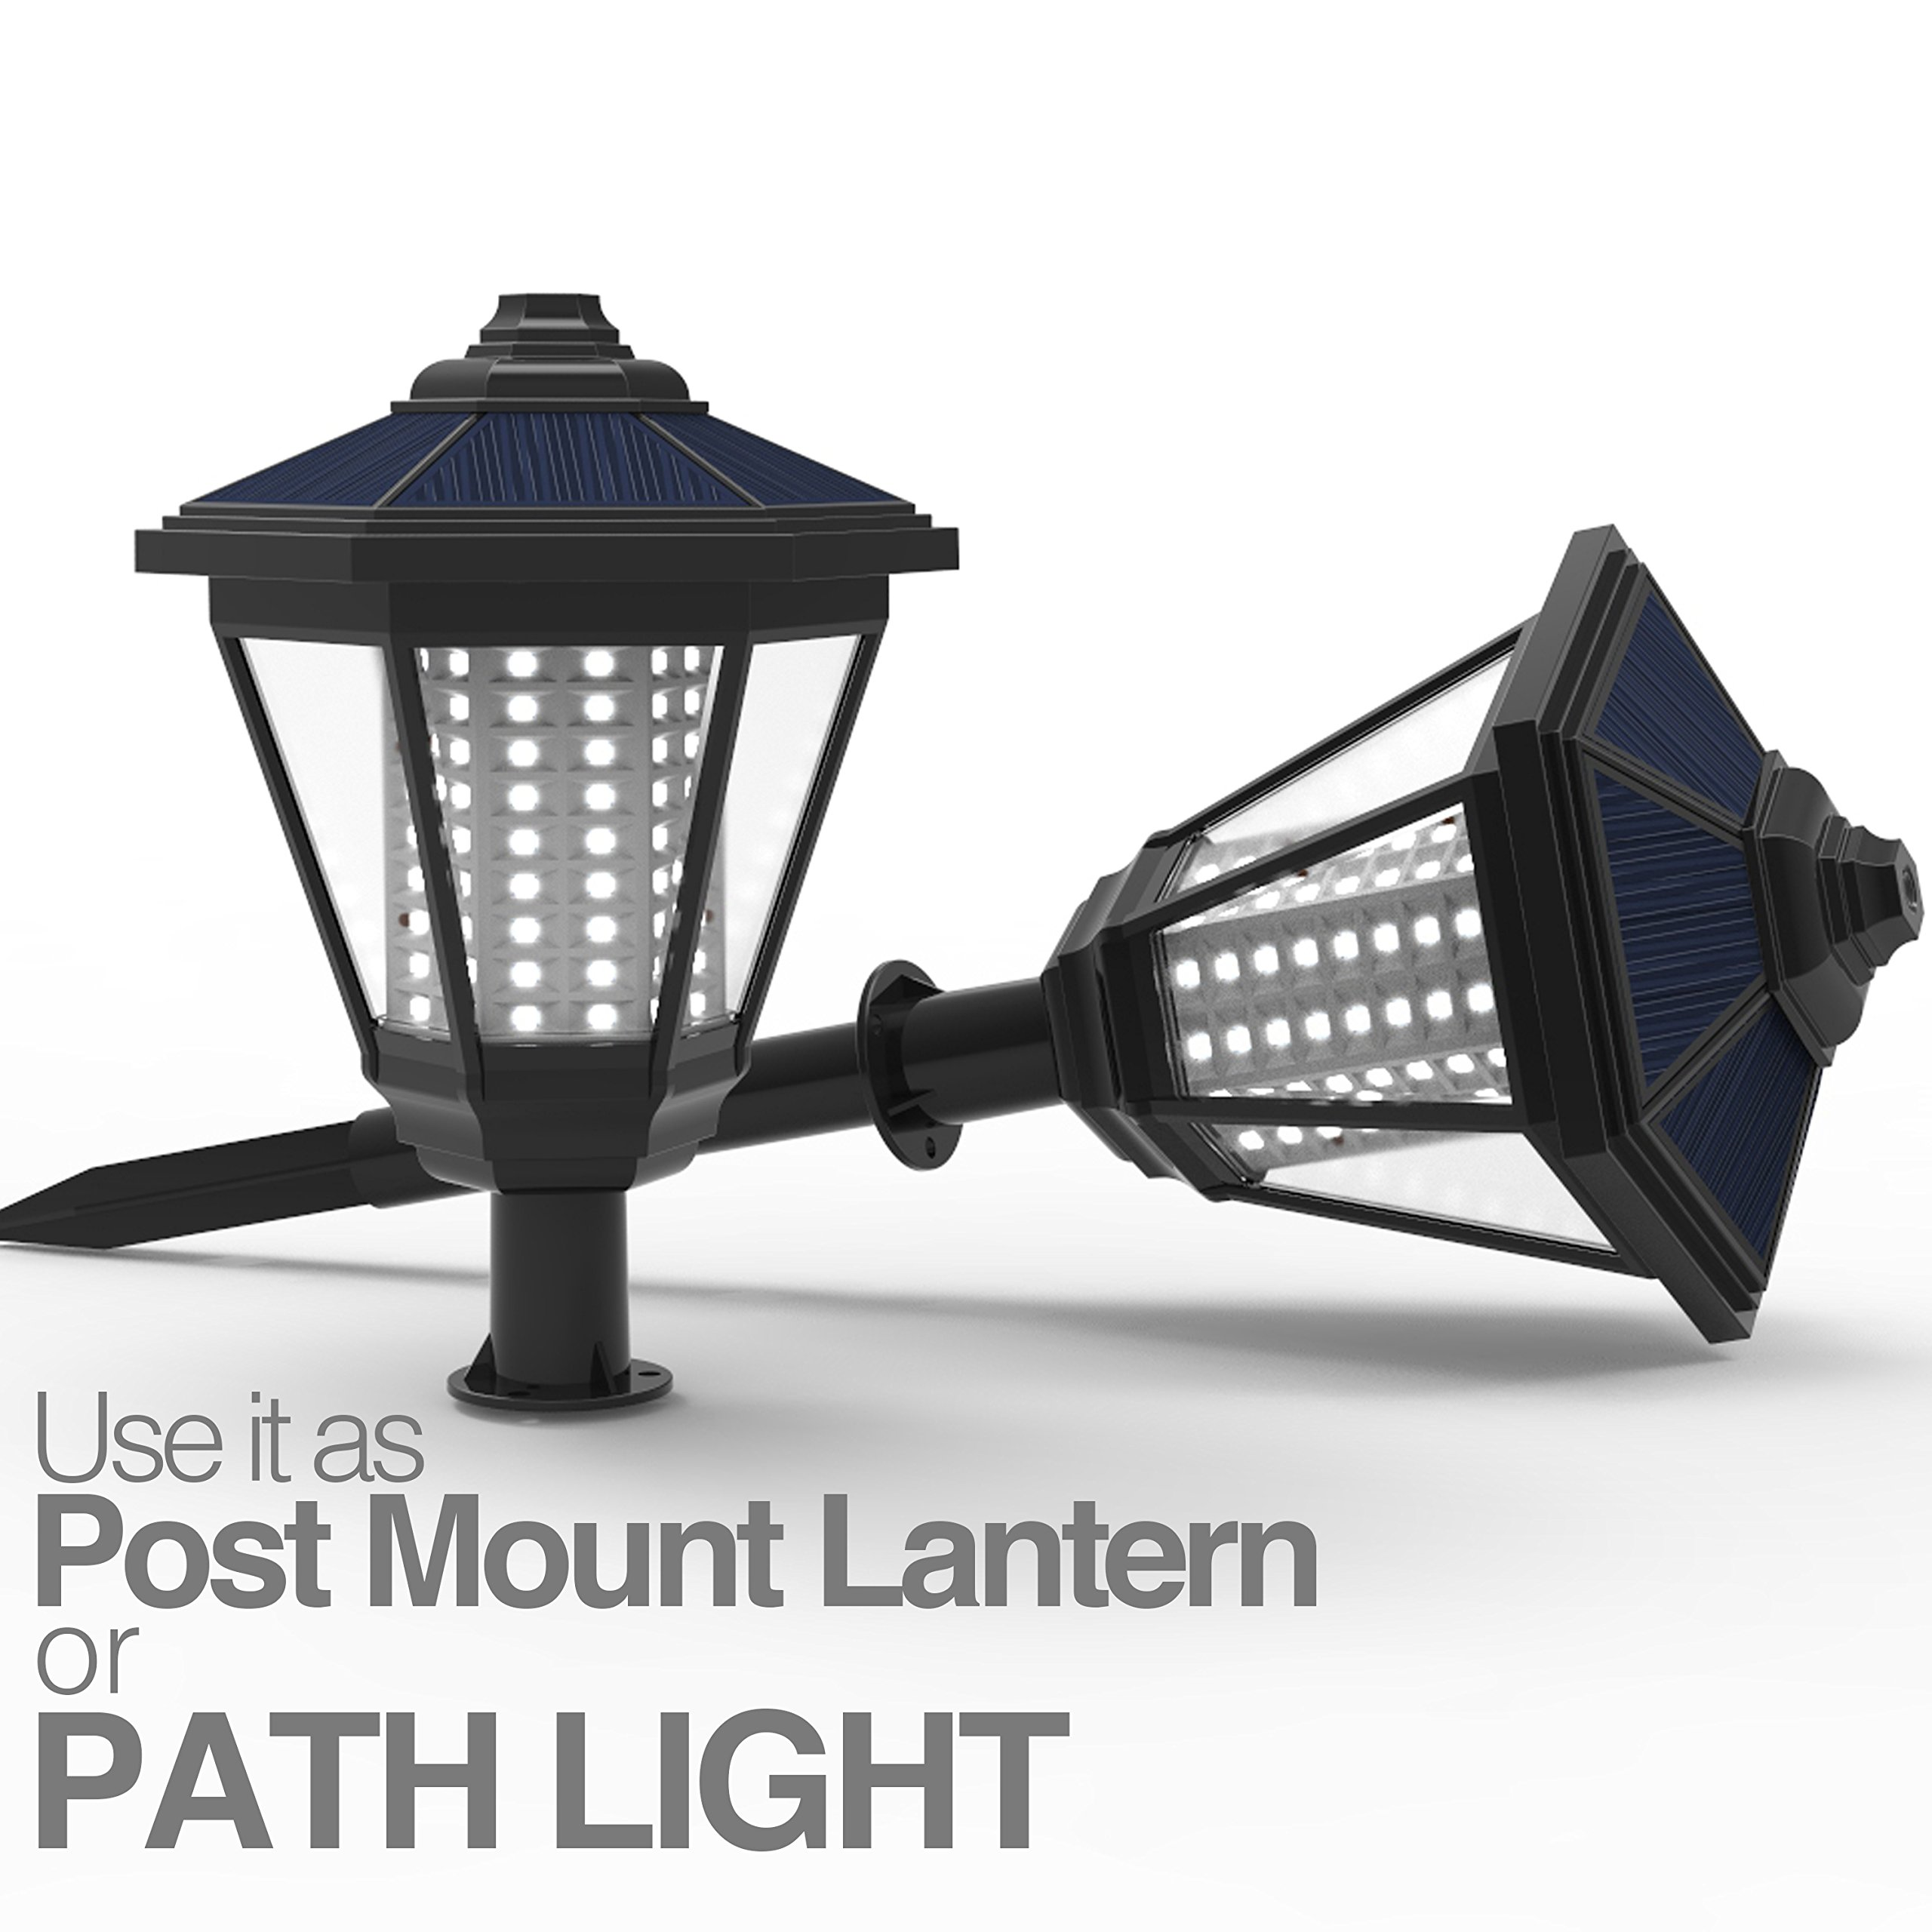 Solar Landscape Lantern Lights: LAMPAT Solar Lights, 108 LED Decorative Columns Post